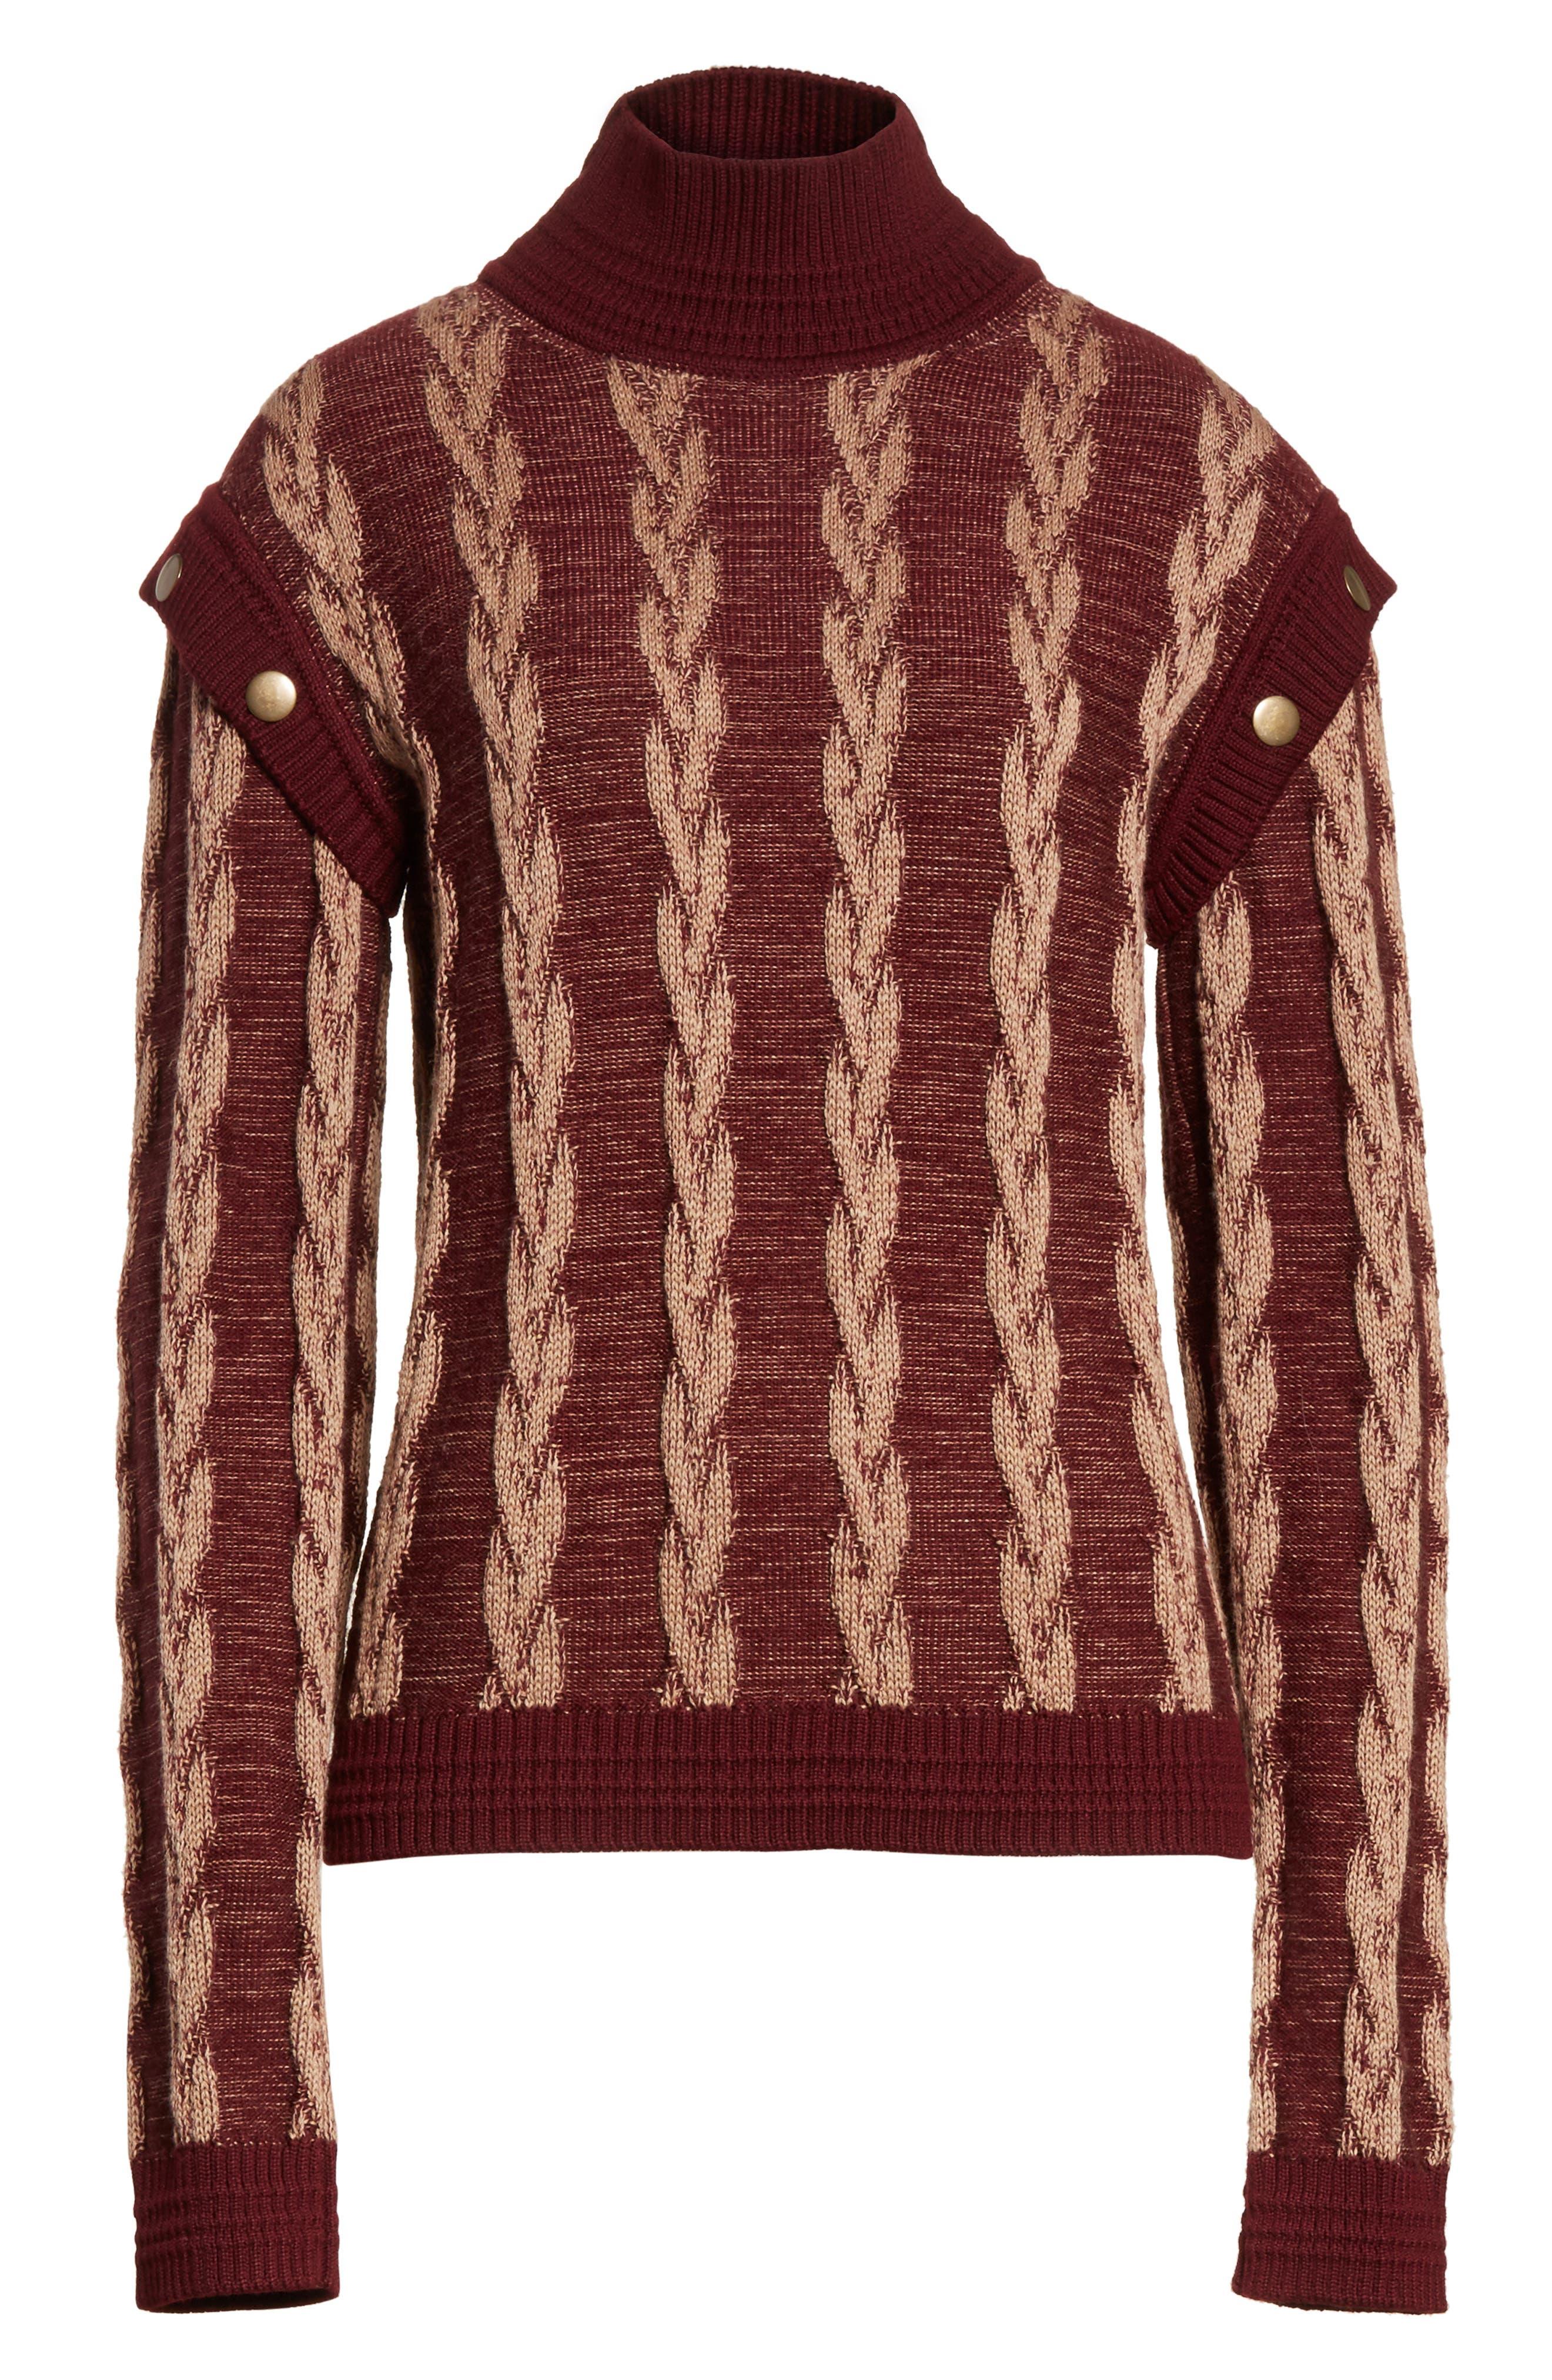 Cable Knit Turtleneck Sweater,                             Alternate thumbnail 6, color,                             930